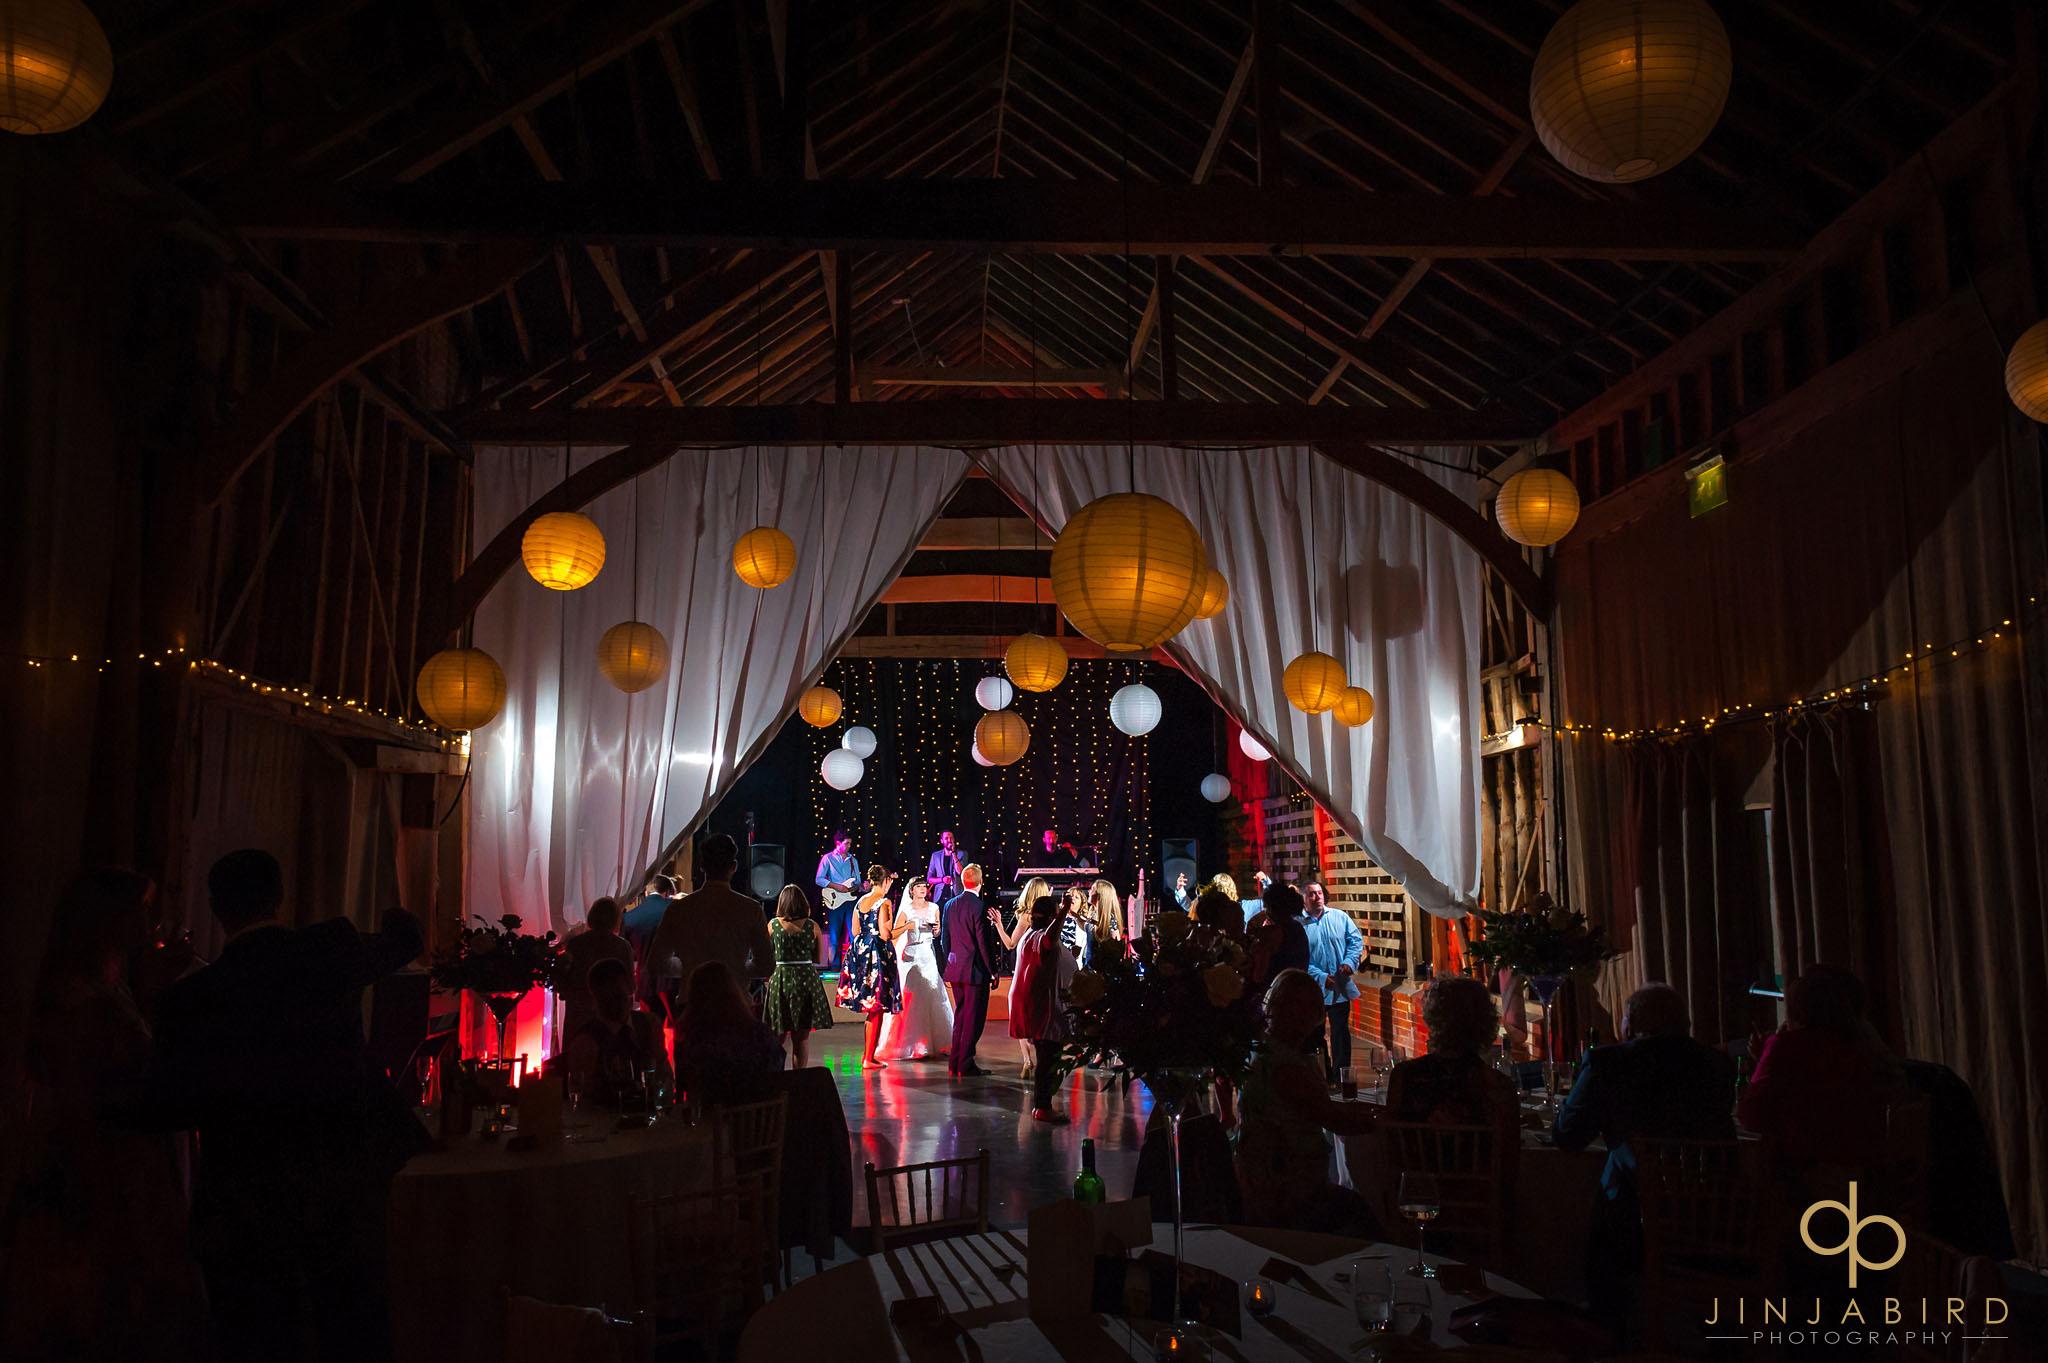 childerley hall evening wedding reception